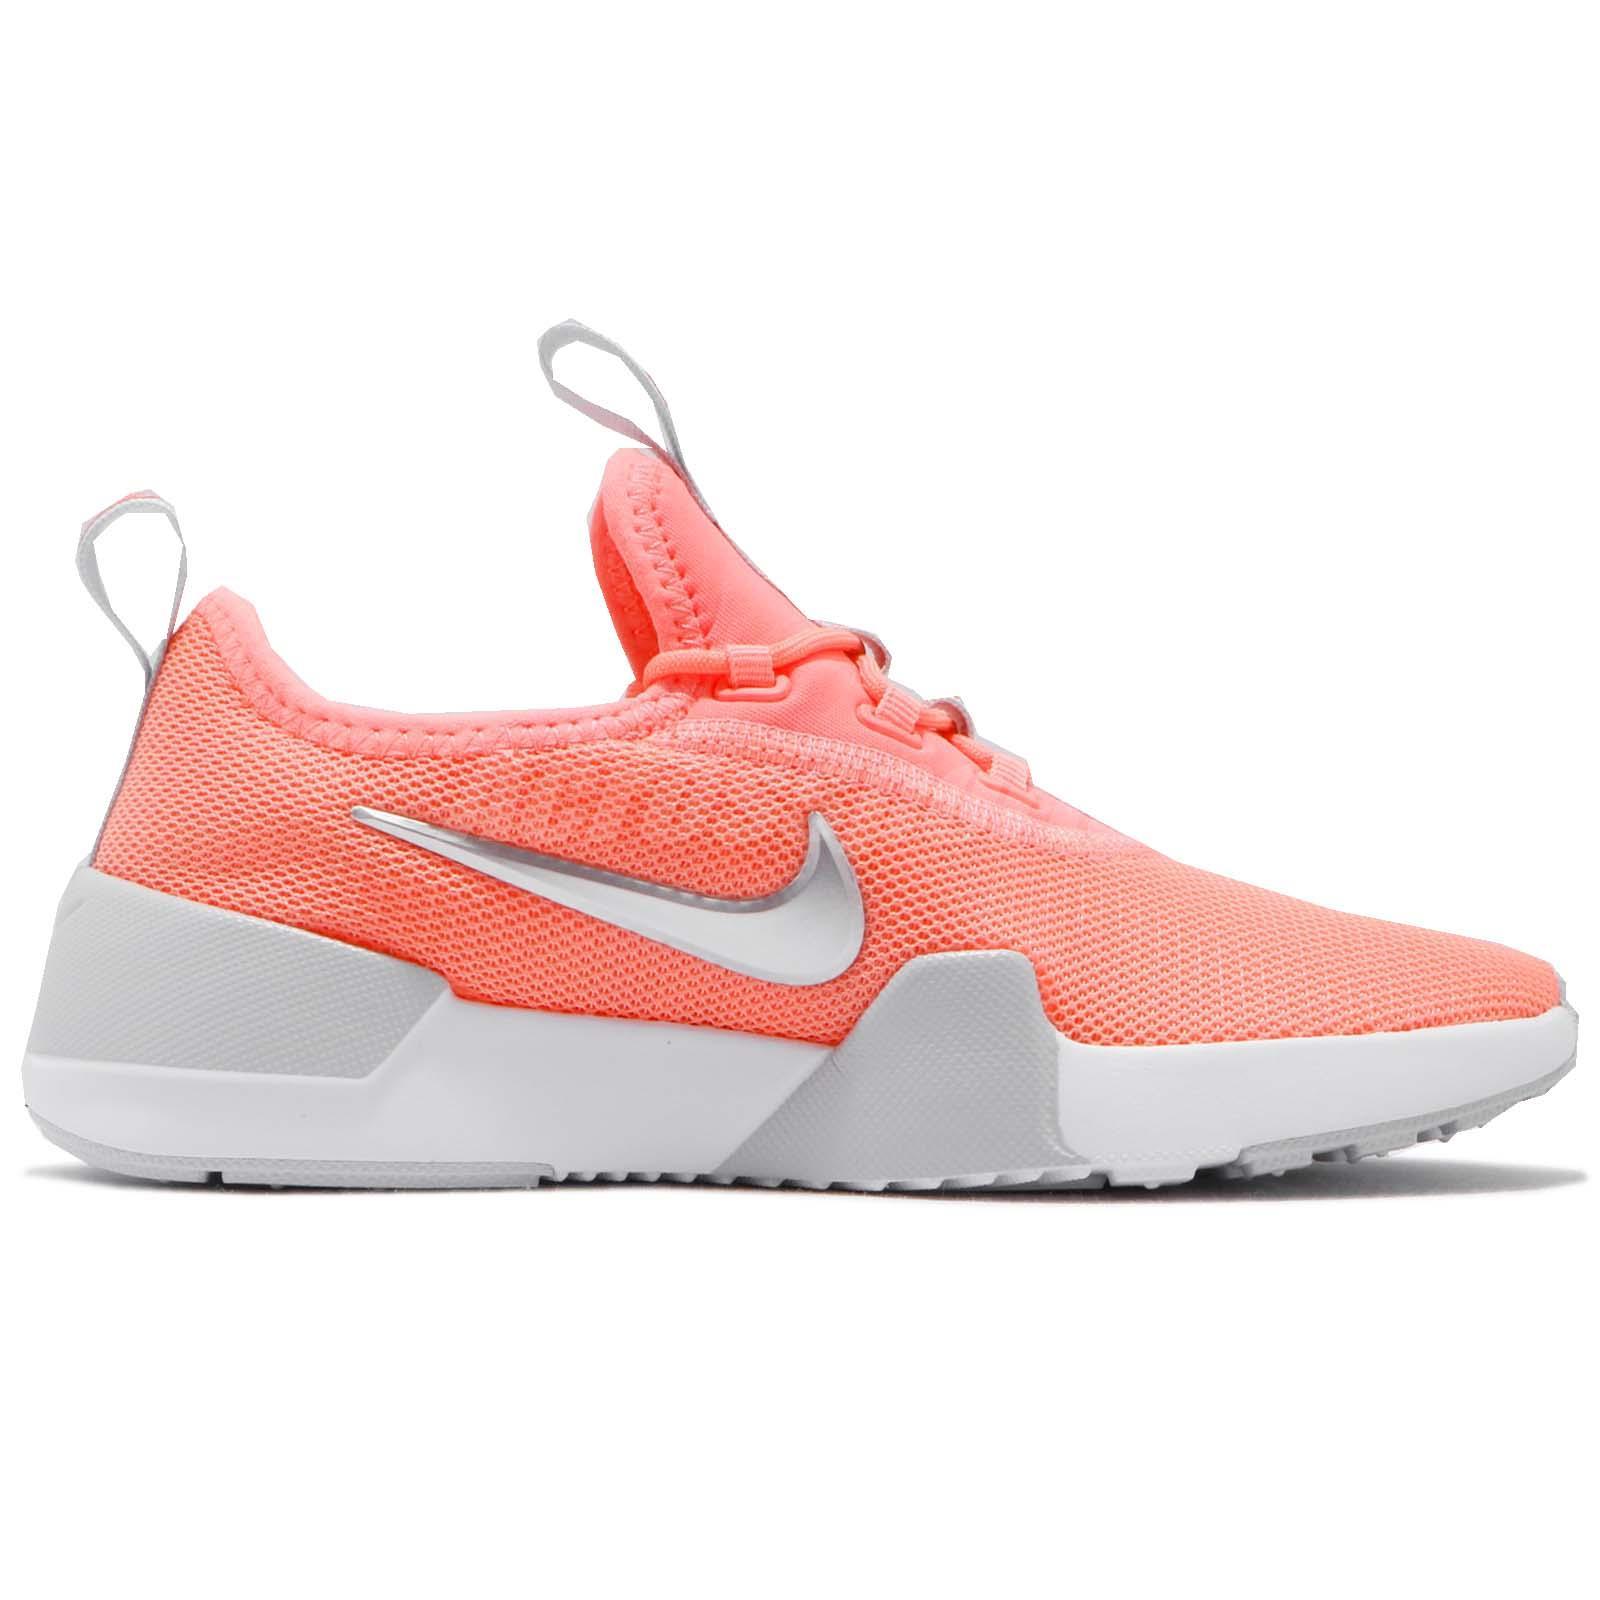 d7dbc8b09677a Nike Ashin Modern PS Pink Silver Preschool Kids Girls Running Shoes ...